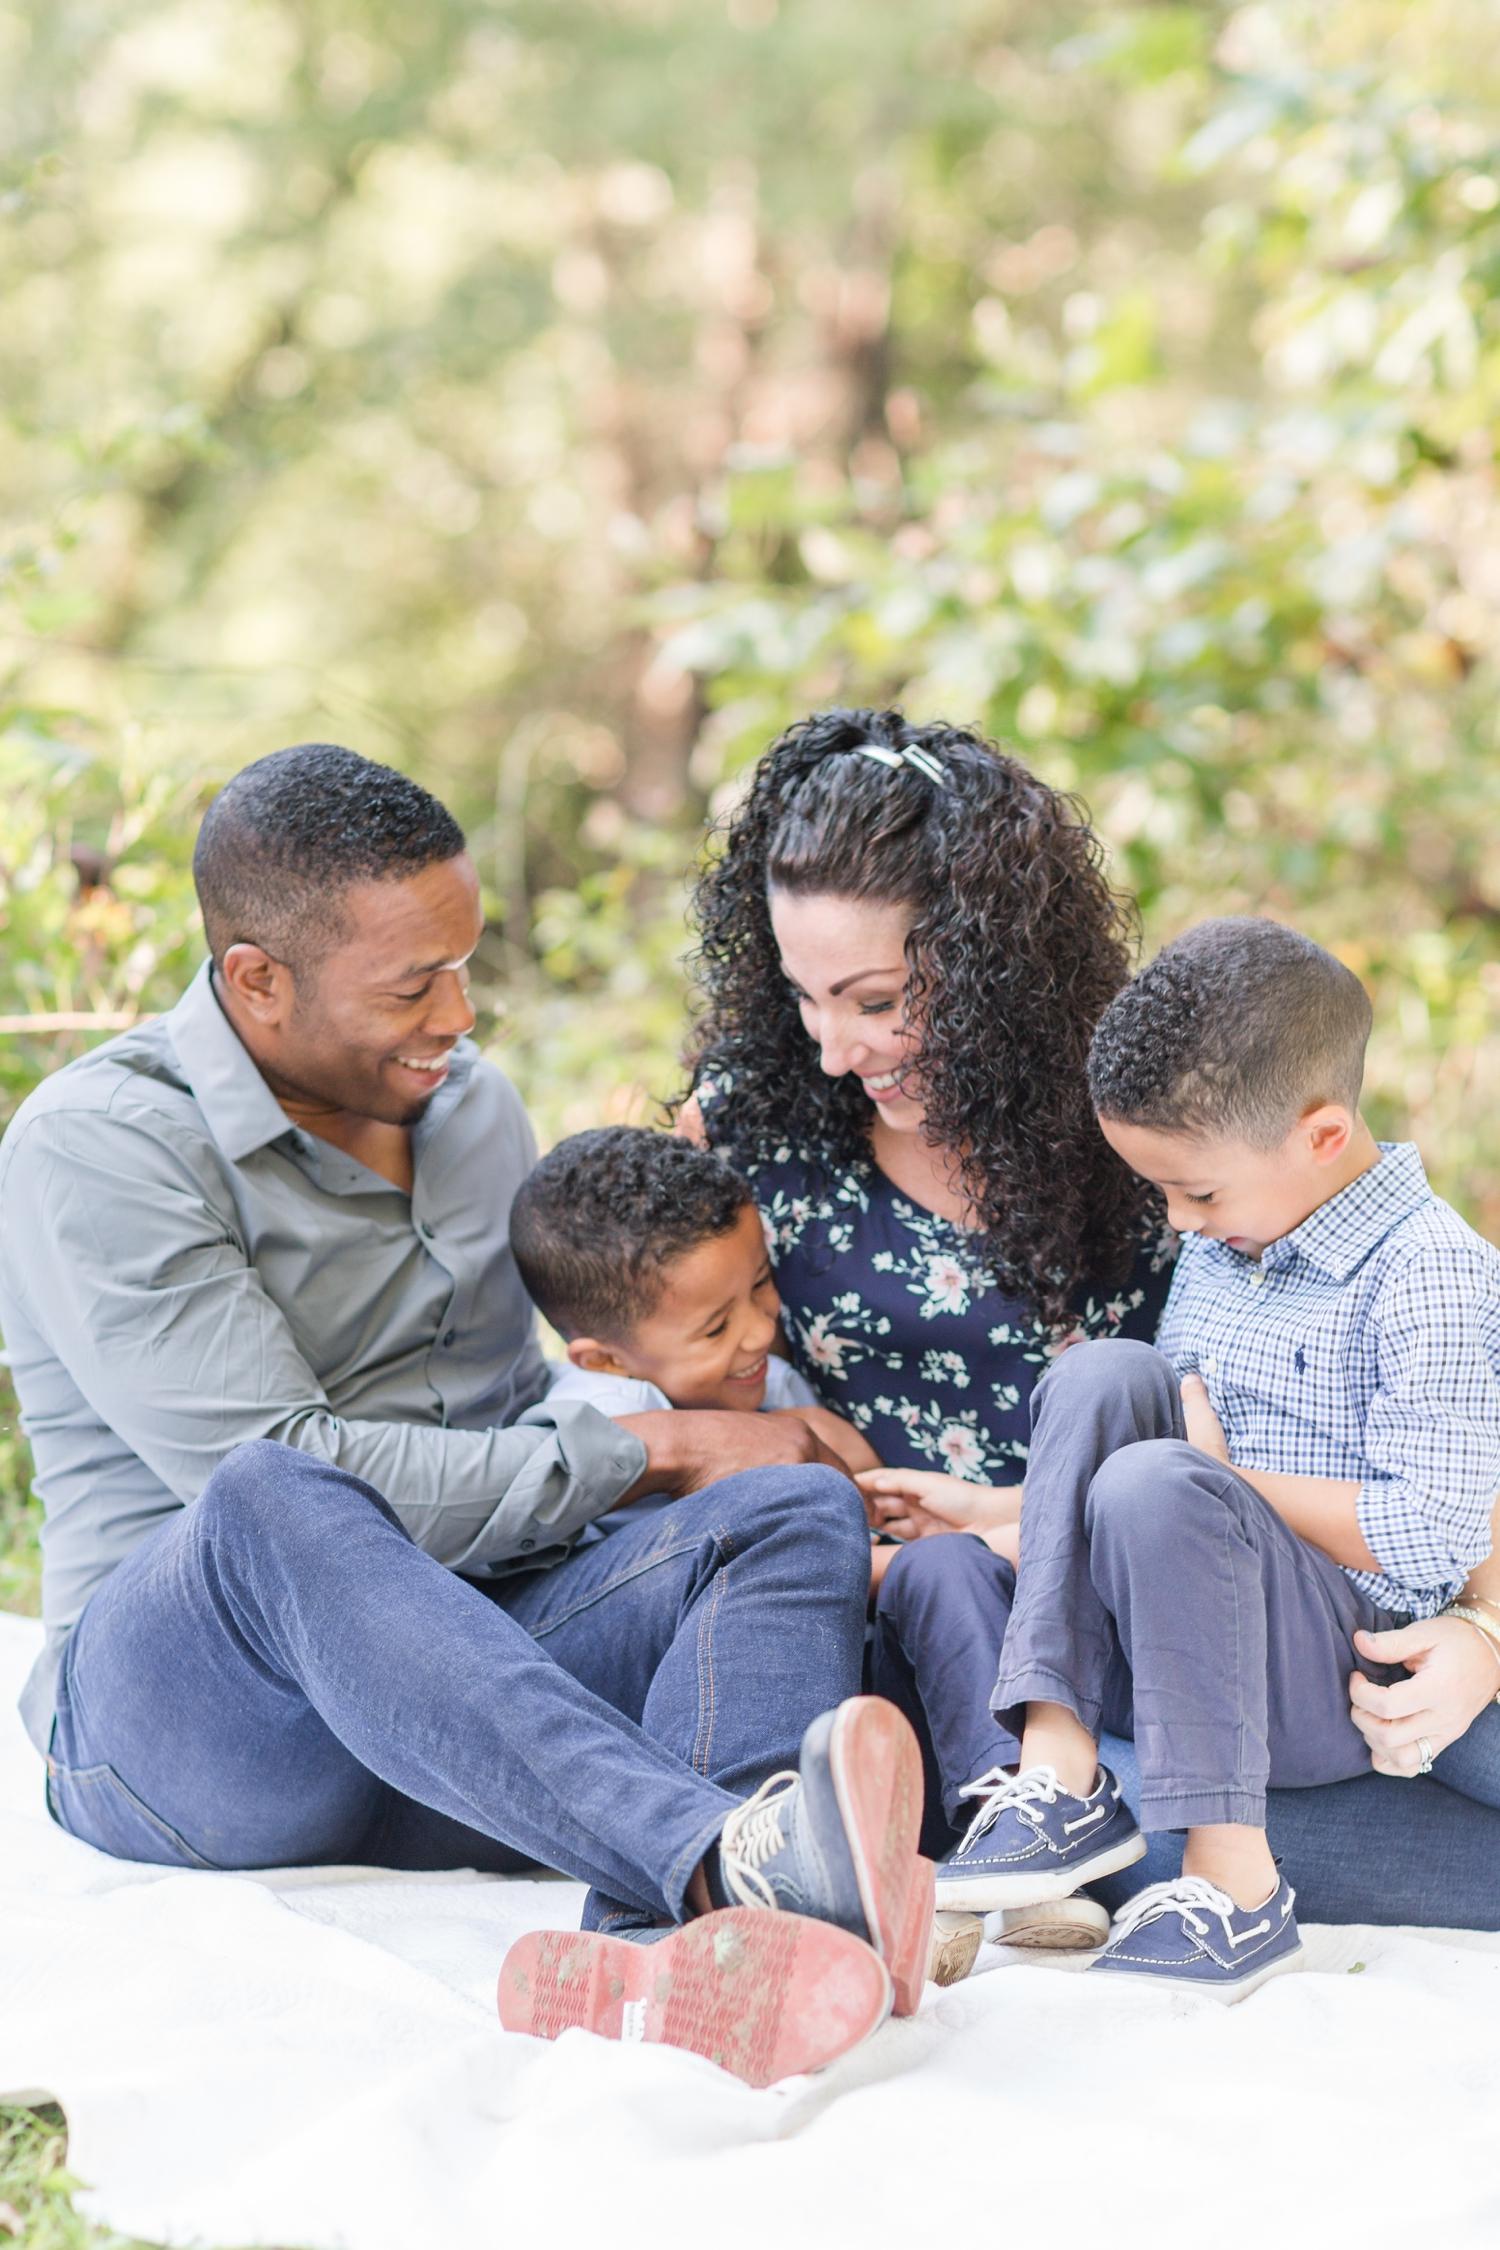 Smith-Padgett Family 2018-57_Jerusalem-Mill-Maryland-Family-Photographer-anna-grace-photography-photo.jpg